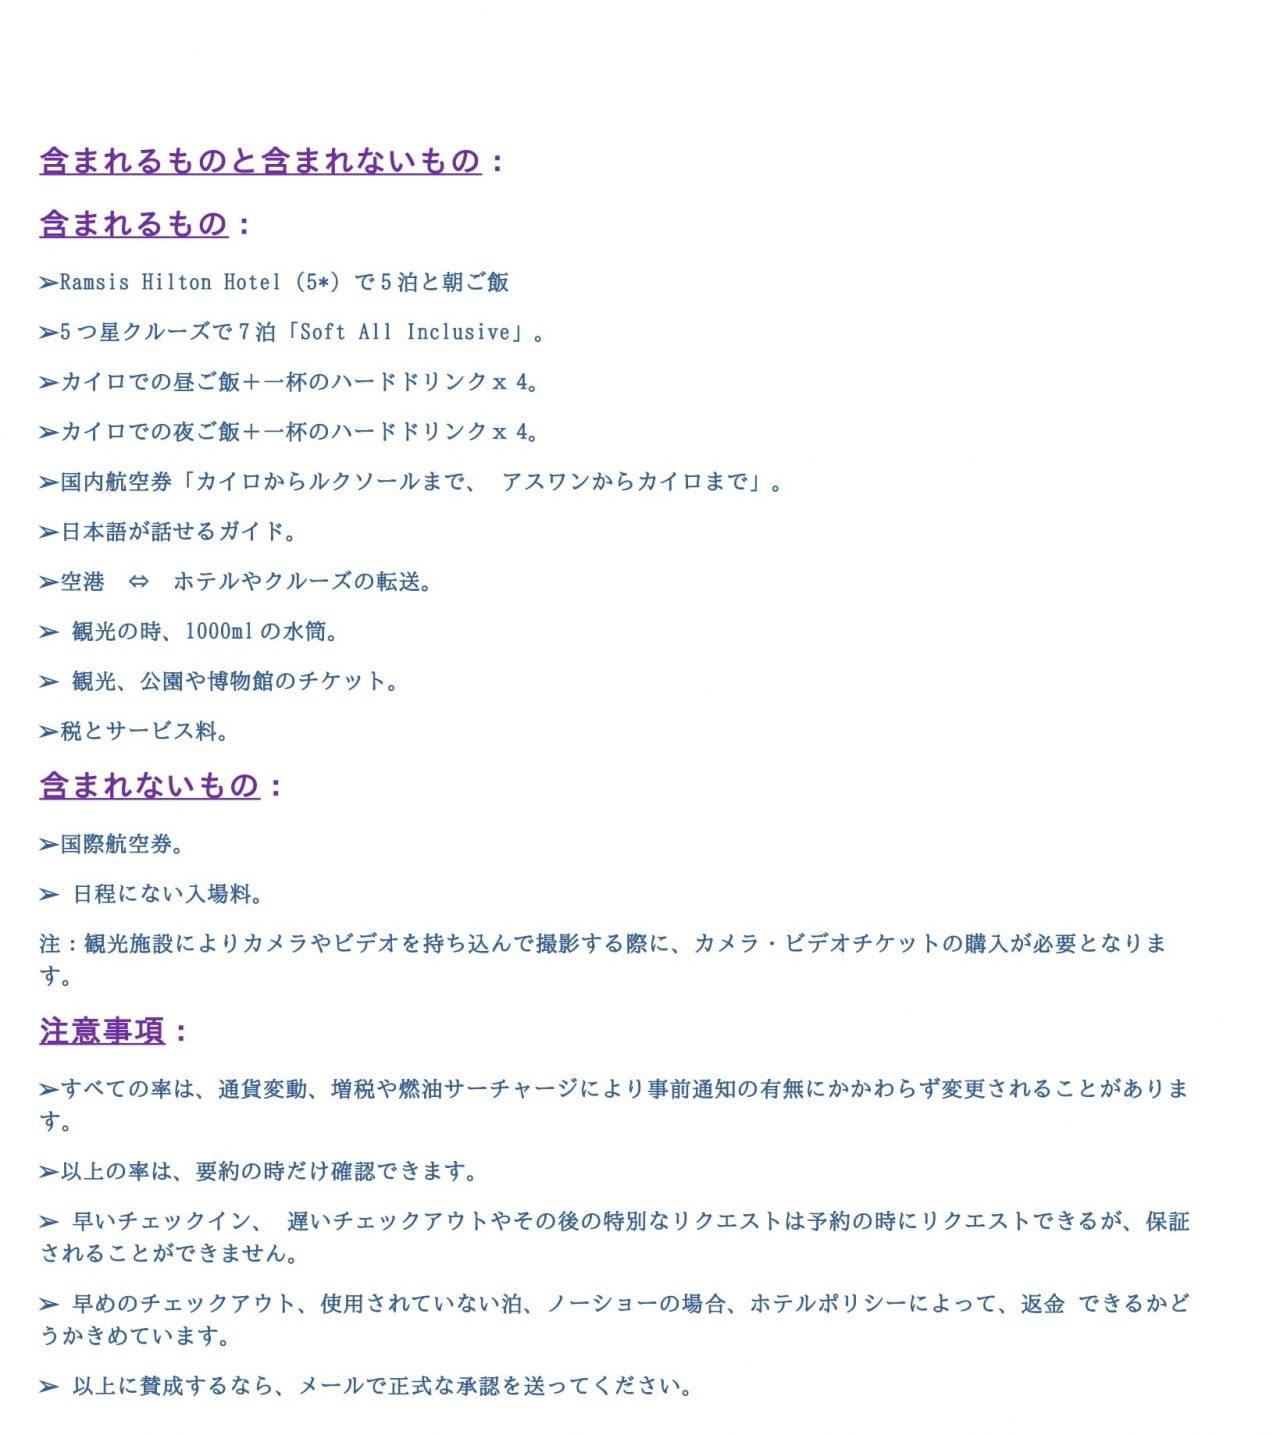 https://traveda.net/wp-content/uploads/2019/03/CAIROLUXOR-ASWAN-CRUISEDAY-USE@-ALEXANDRIA-13DAYS-12NIGHTS-Japanese-2-1280x1435.jpg